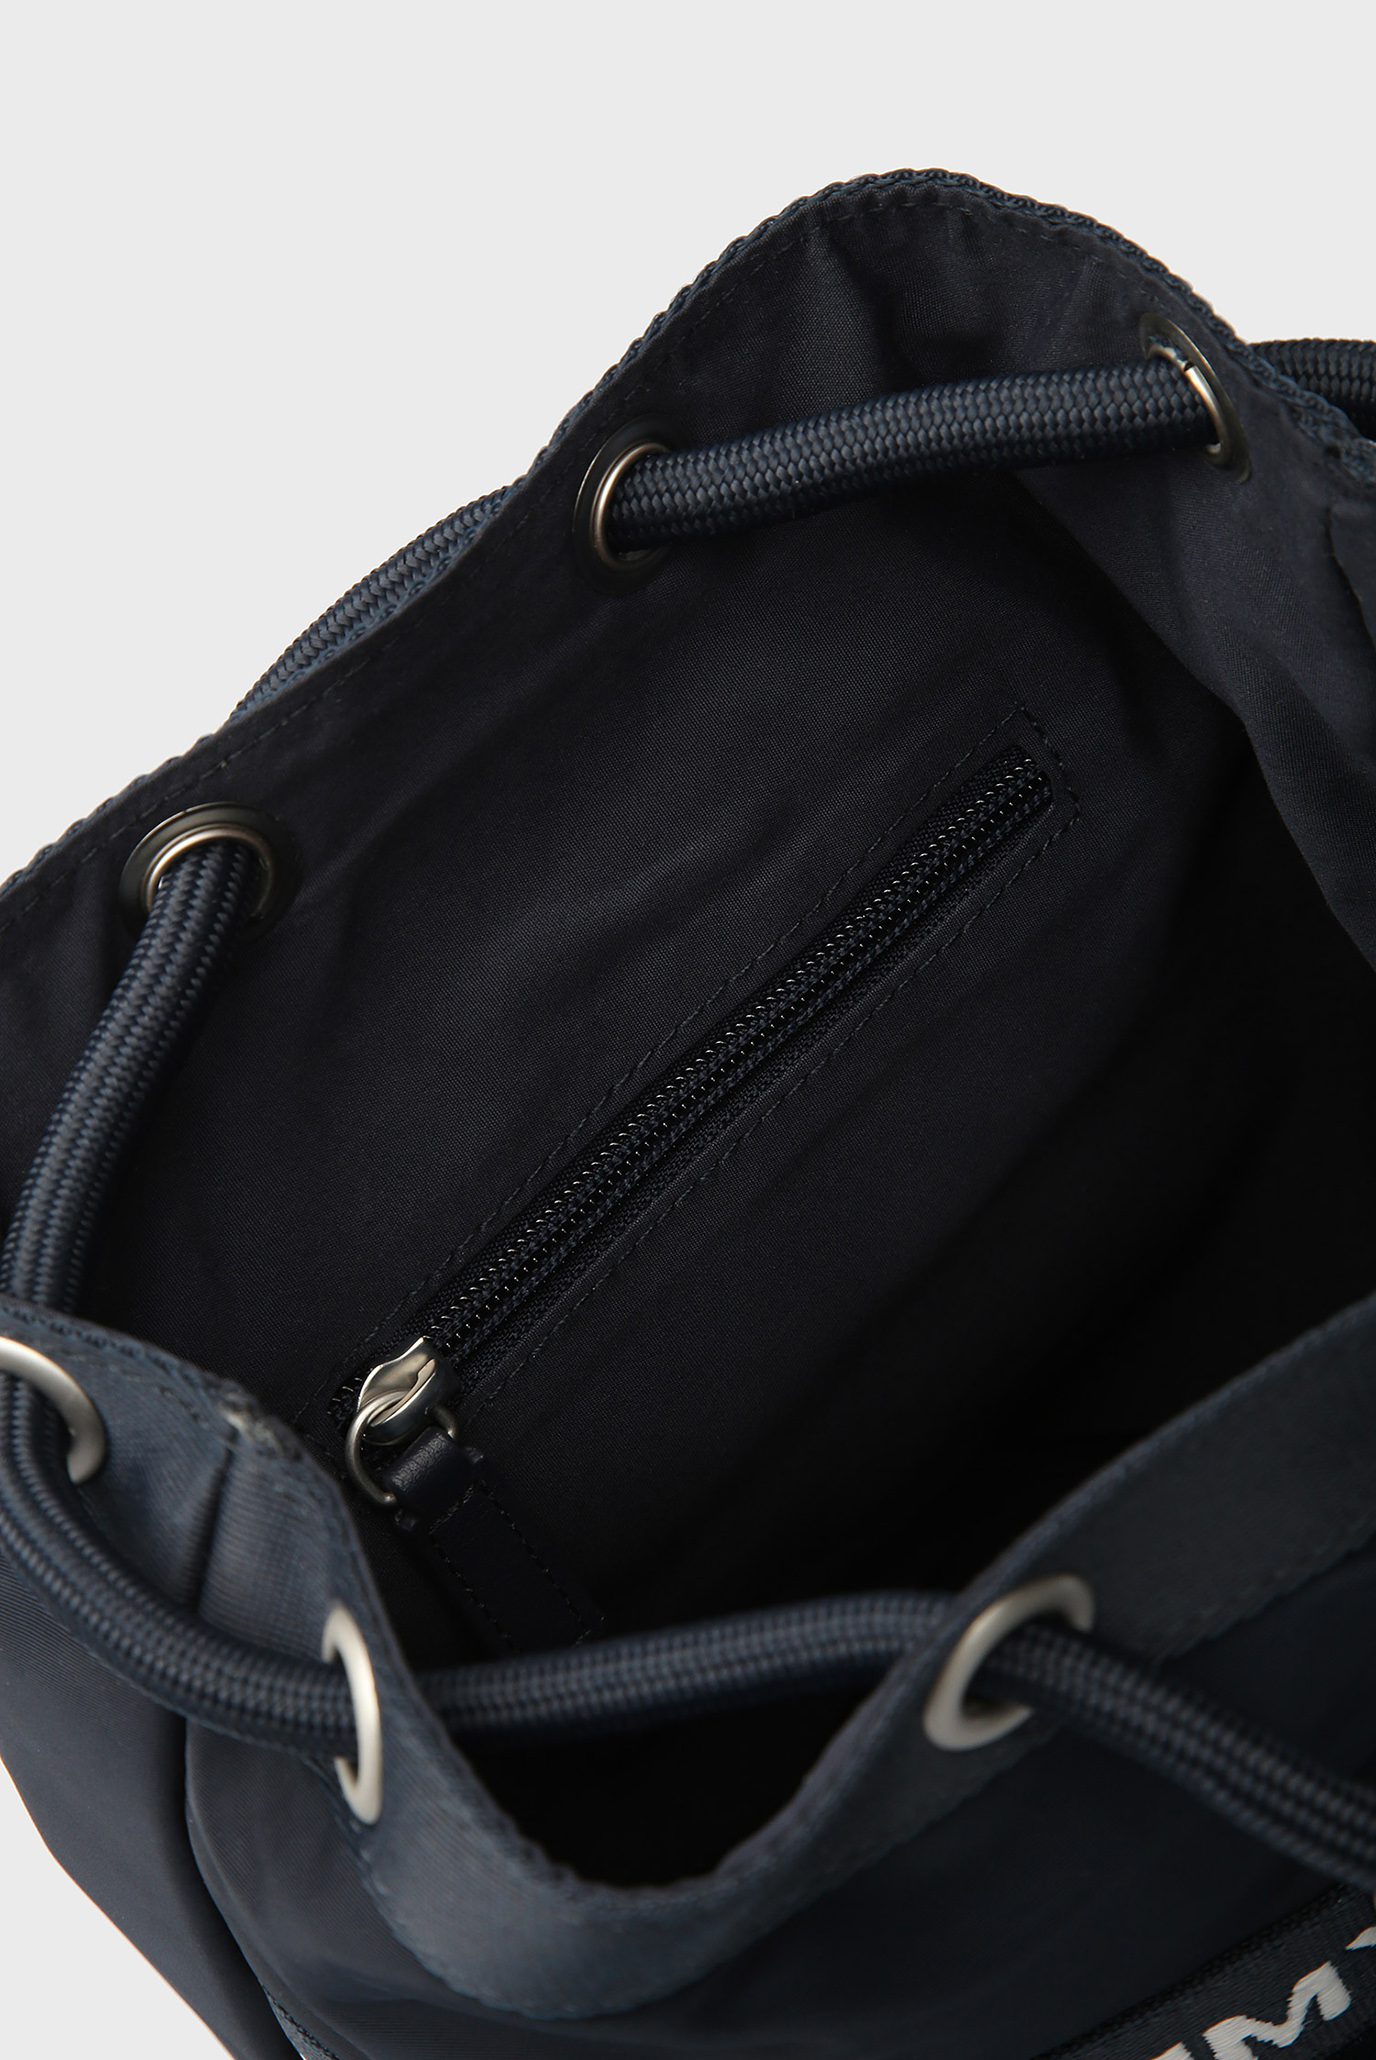 Купить Синий рюкзак TJ HERITAGE MINI Tommy Hilfiger Tommy Hilfiger AU0AU00251 – Киев, Украина. Цены в интернет магазине MD Fashion